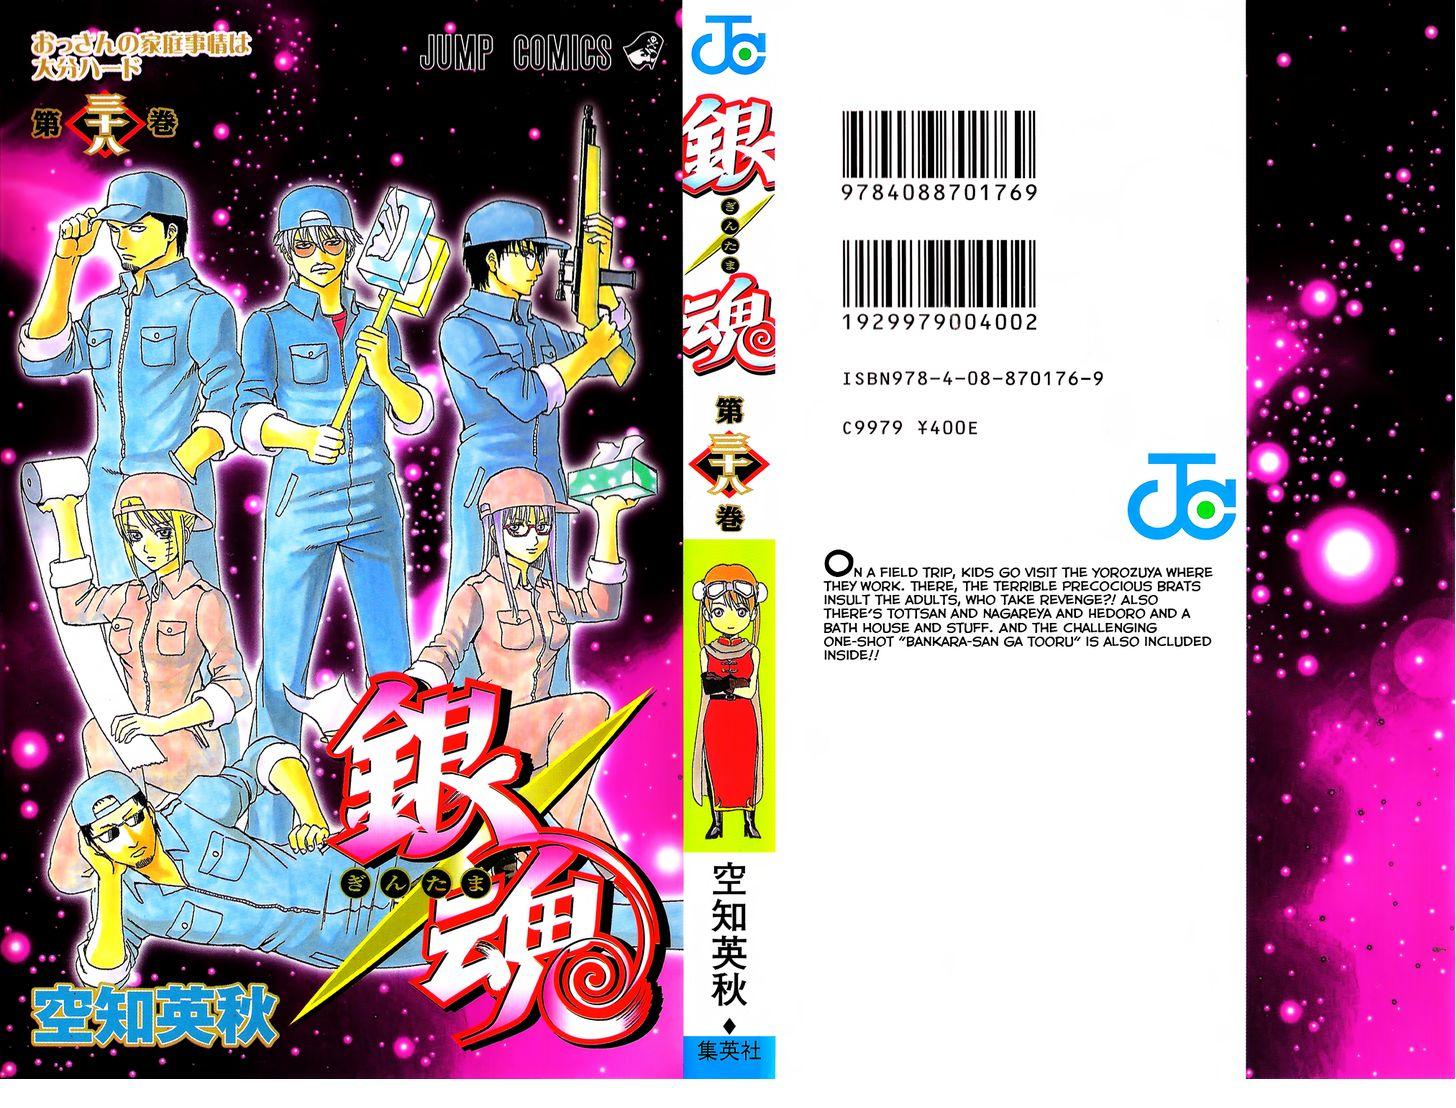 http://im.nineanime.com/comics/pic9/18/210/17168/Gintama3290213.jpg Page 1